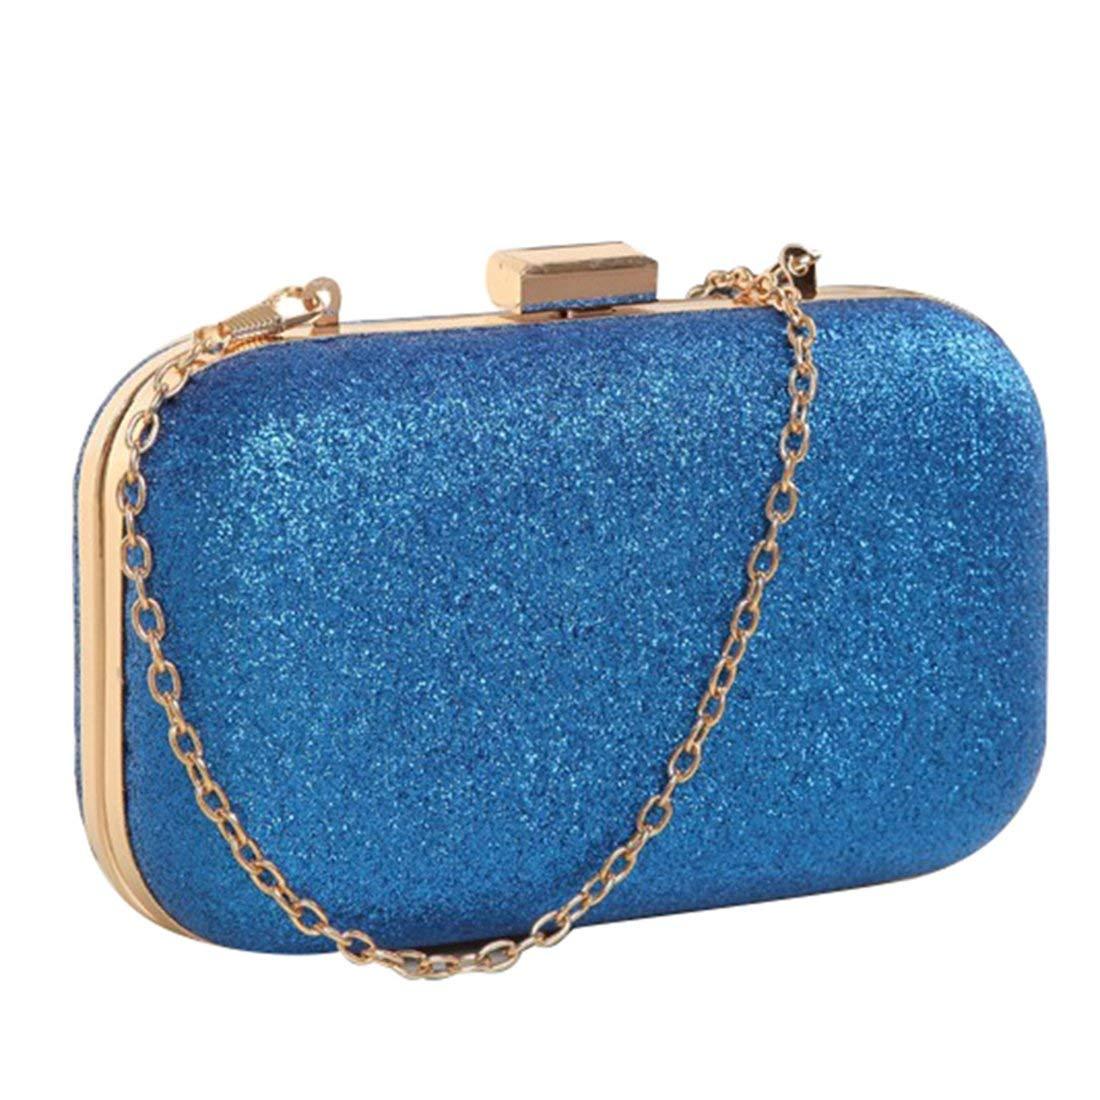 Mini Evening Bag - SODIAL(R)PU leather Women's mini evening bag fashion clutch banquet bag girls shoulder bag Messenger bag, Blue